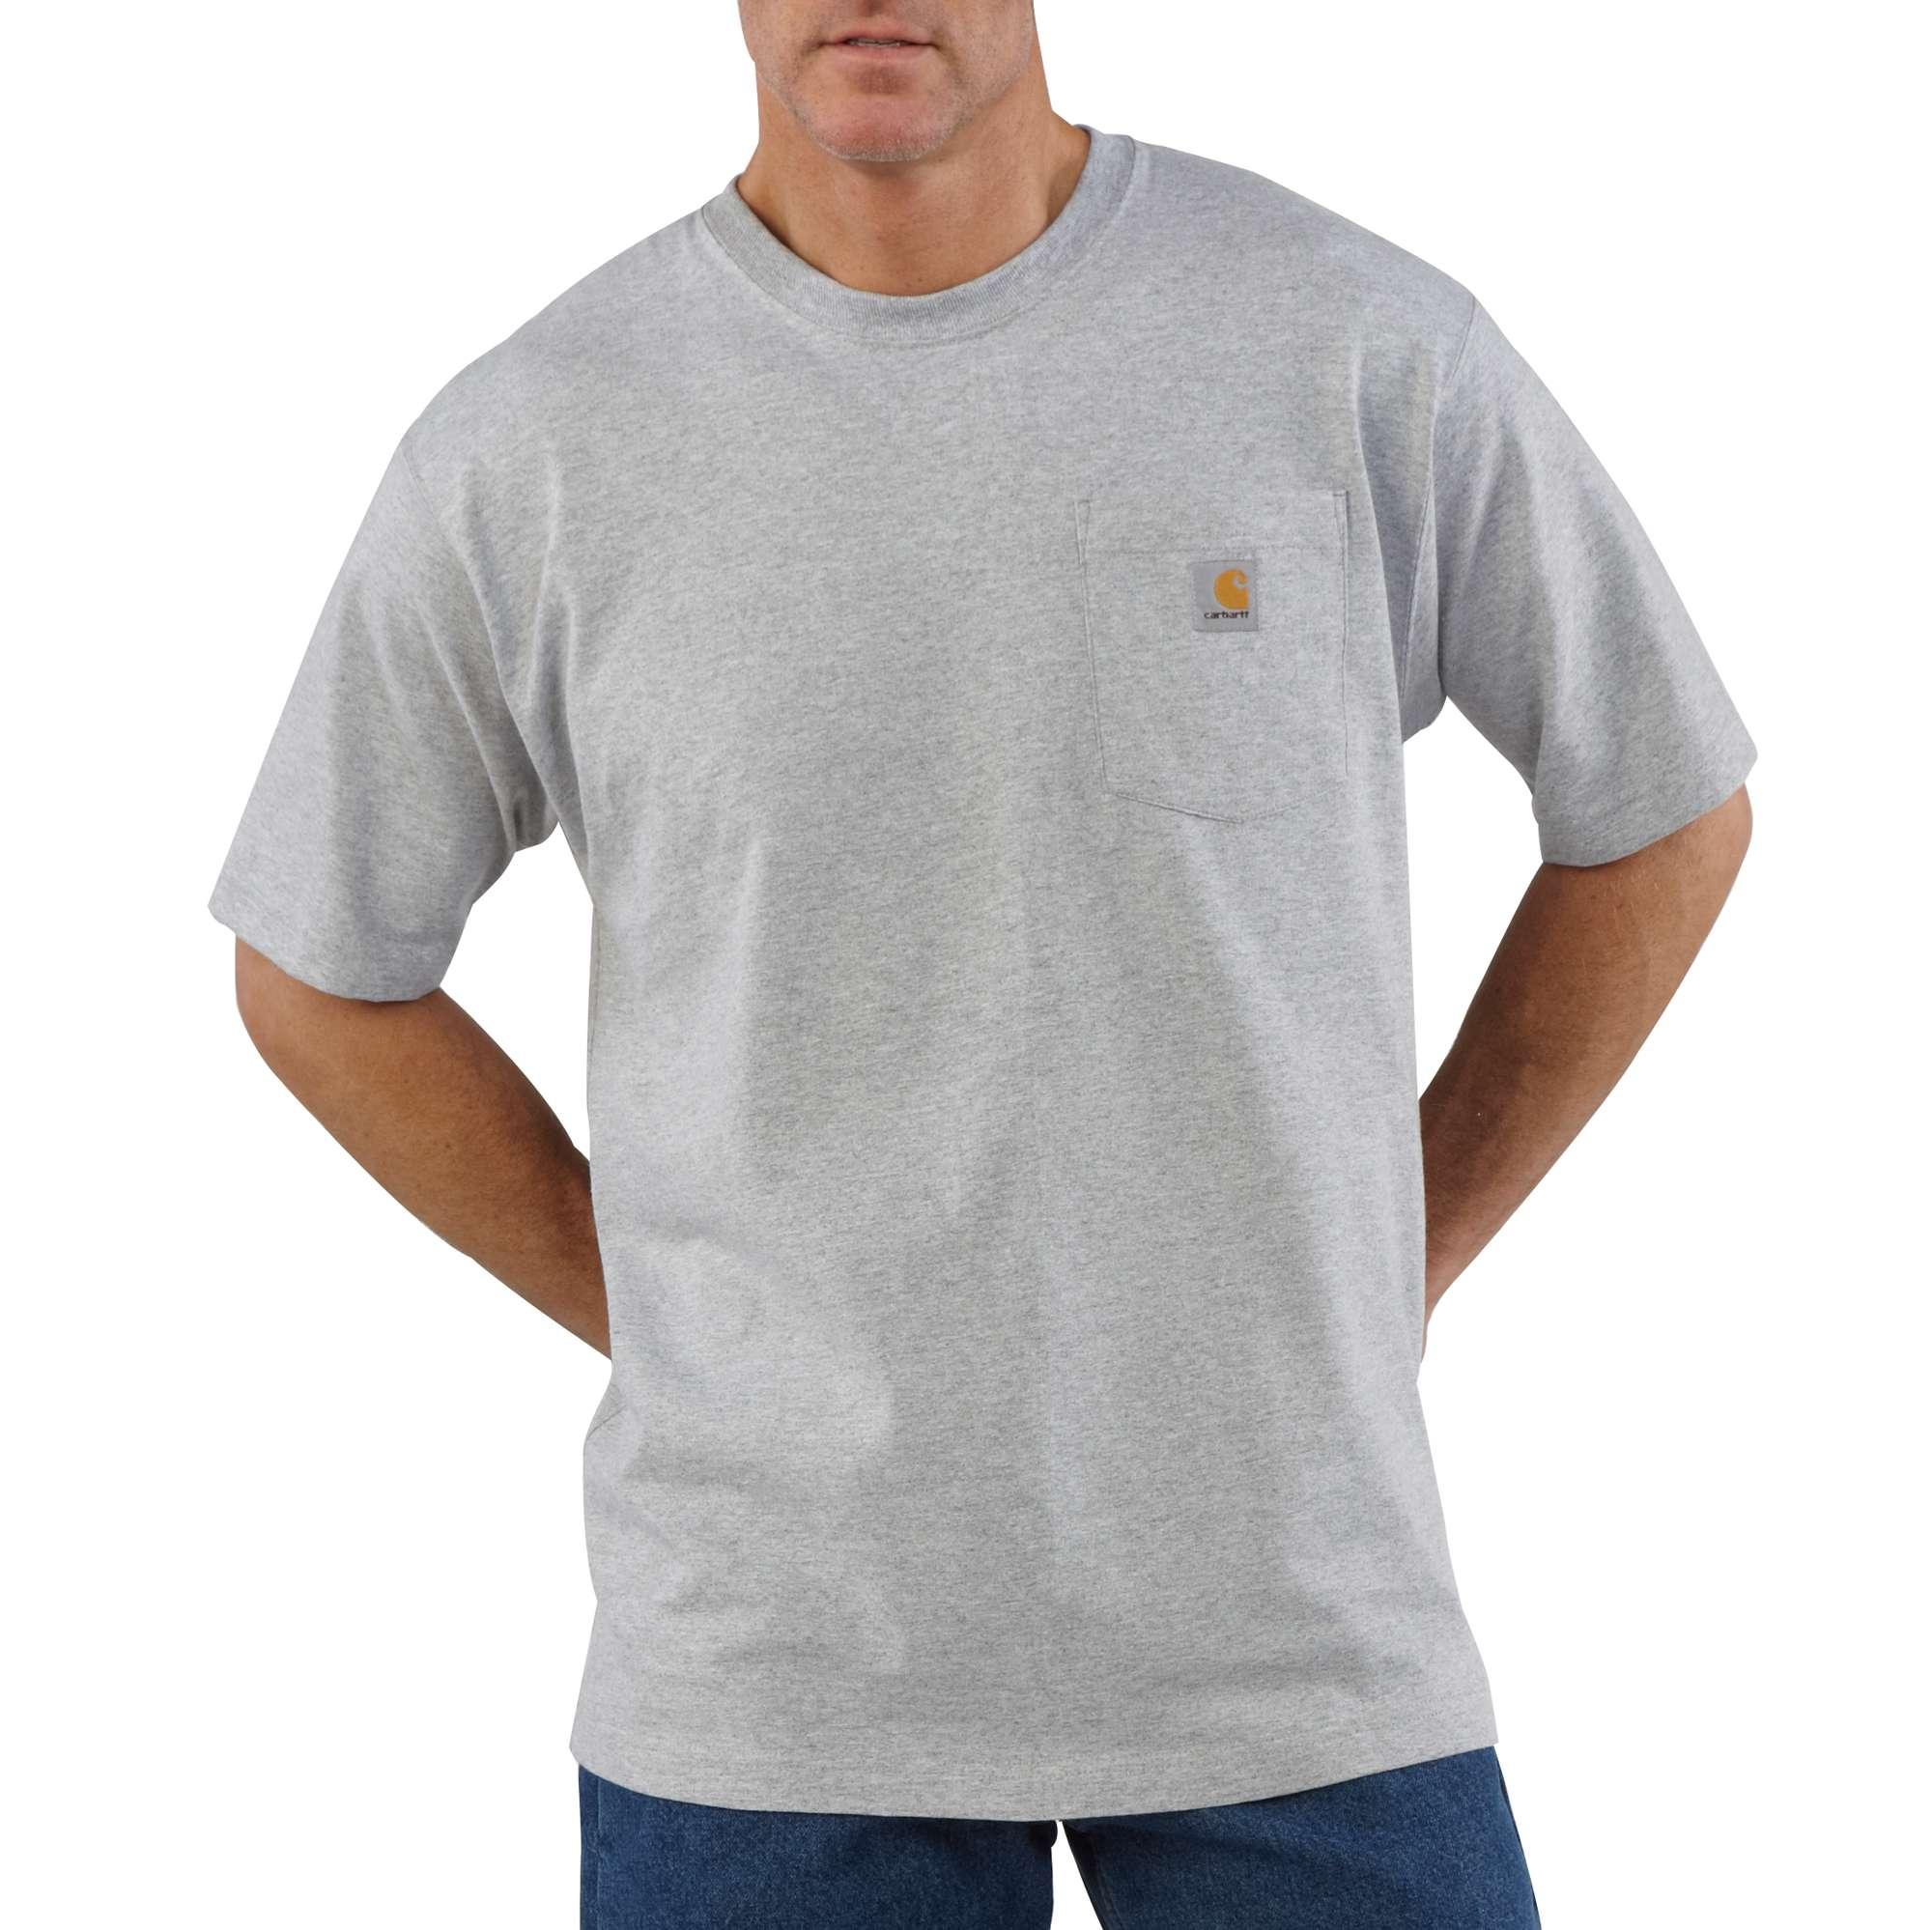 Men's Big & Tall Workwear Pocket T-shirt, Heather Gray, swatch